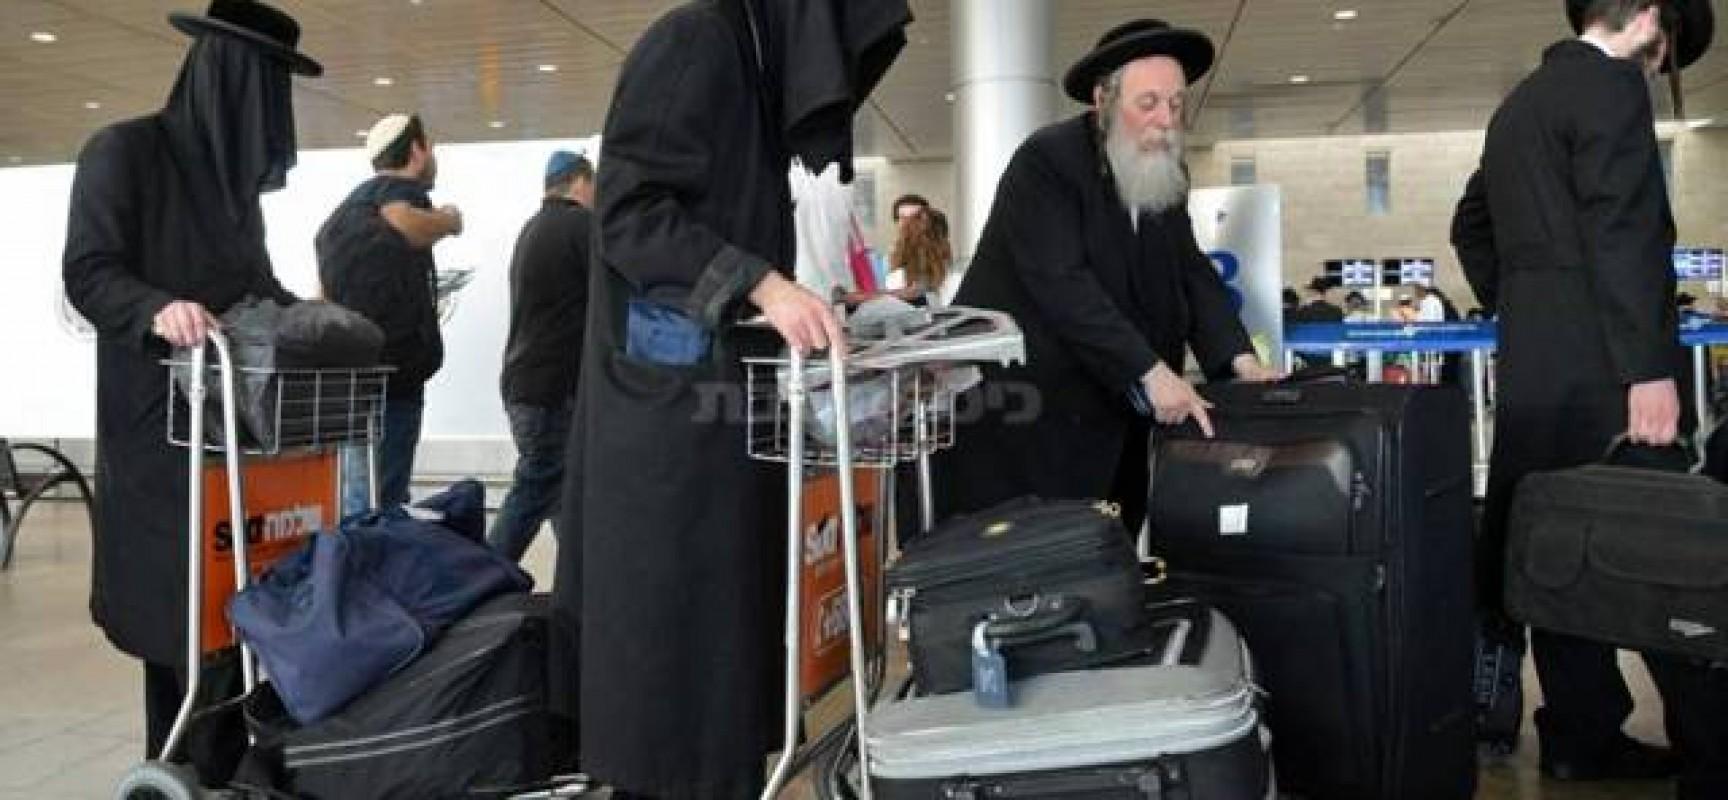 https://i1.wp.com/reseauinternational.net/wp-content/uploads/2015/01/hommes_en_burka_a_l_aeroport_tel_aviv-1728x800_c.jpg